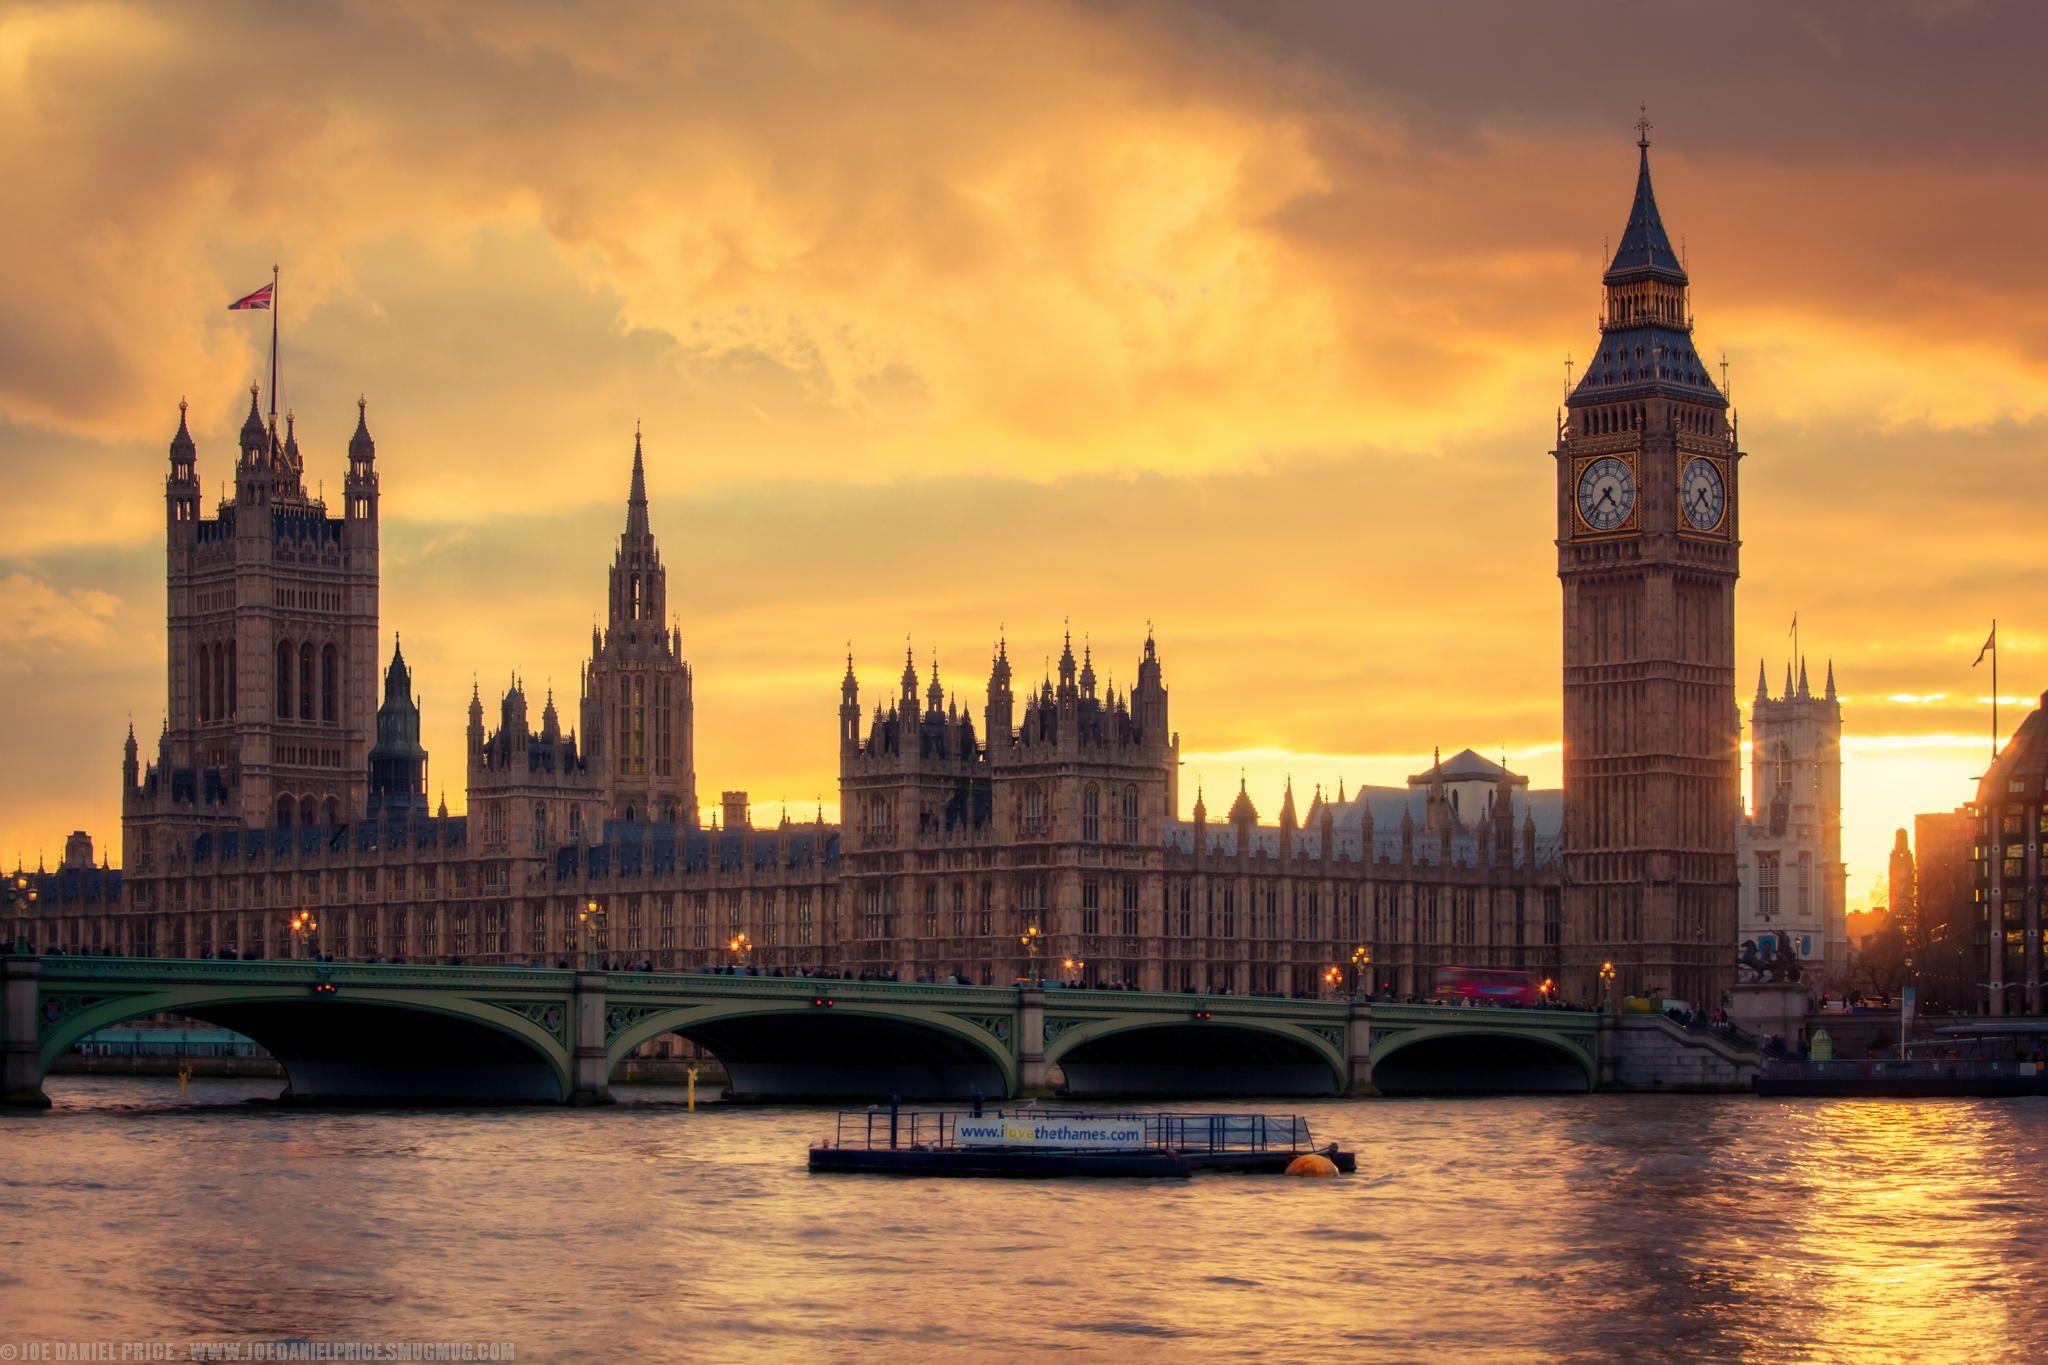 Фотография золотой закат над Биг-Бен, Вестминстер, Лондон, Англия автор Джо Дэниел цена на 500px